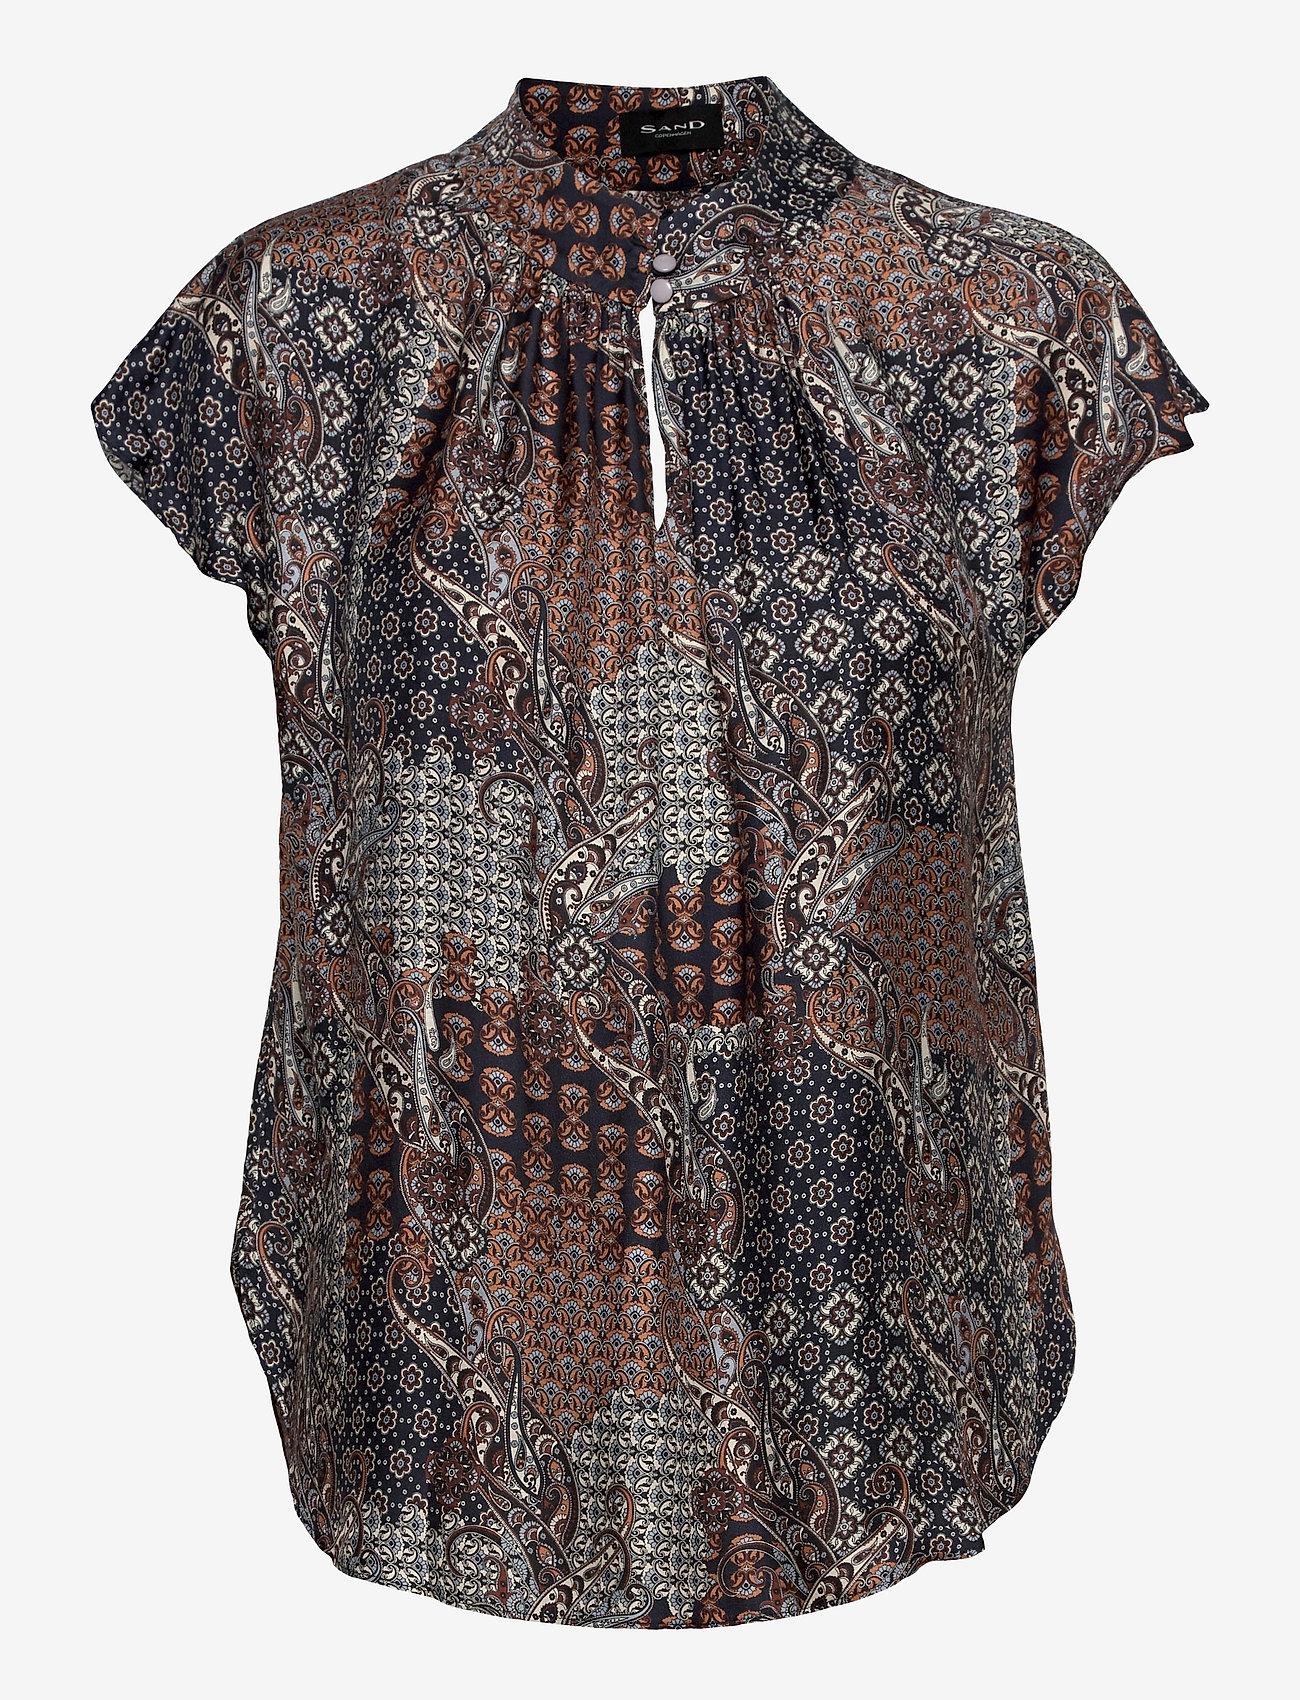 SAND - 3424 - Prosi Top - blouses met korte mouwen - pattern - 0